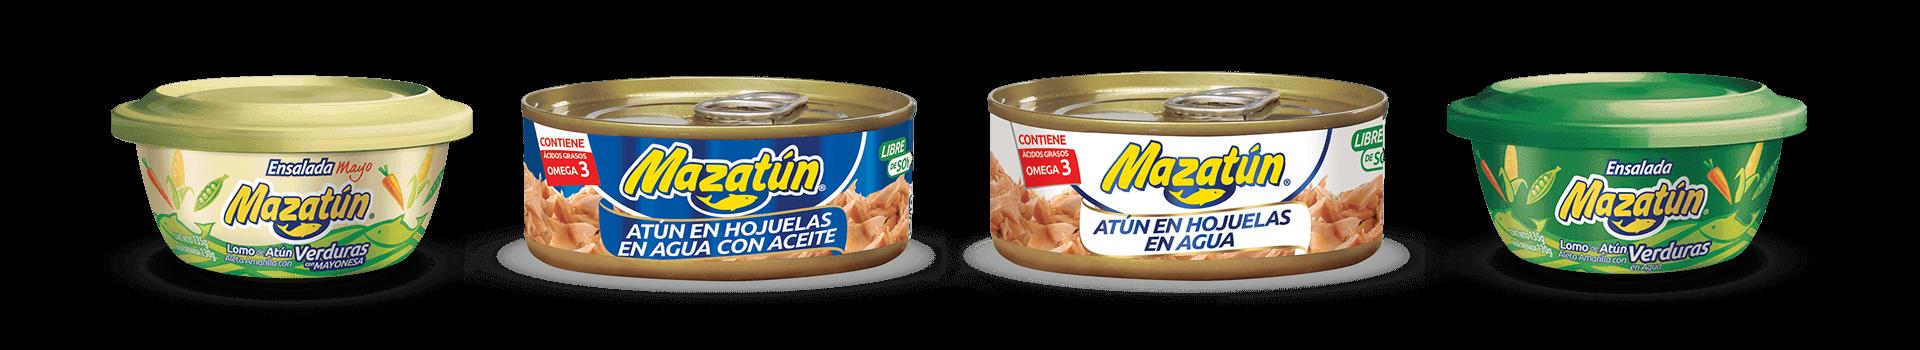 mazatun-banner-productos (1)